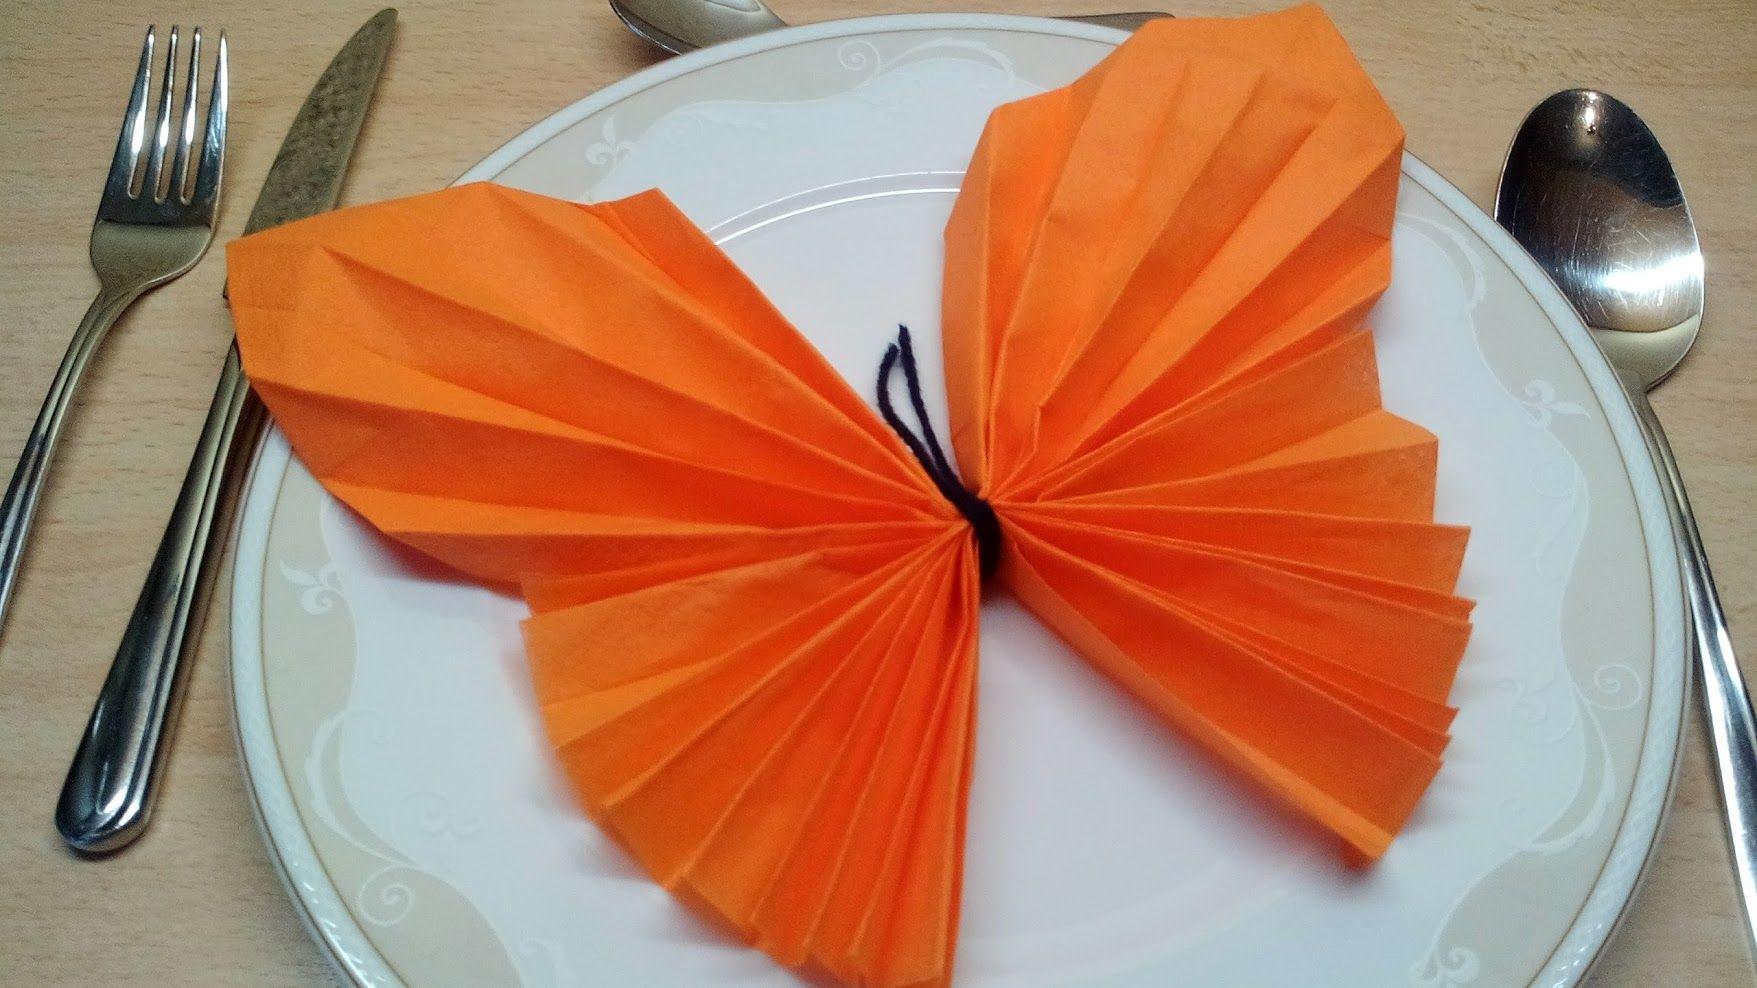 Schmetterling - illustrierte Servietten Faltanleitung (photographed napkin folding instructions for a butterfly #serviettenfalteneinfach